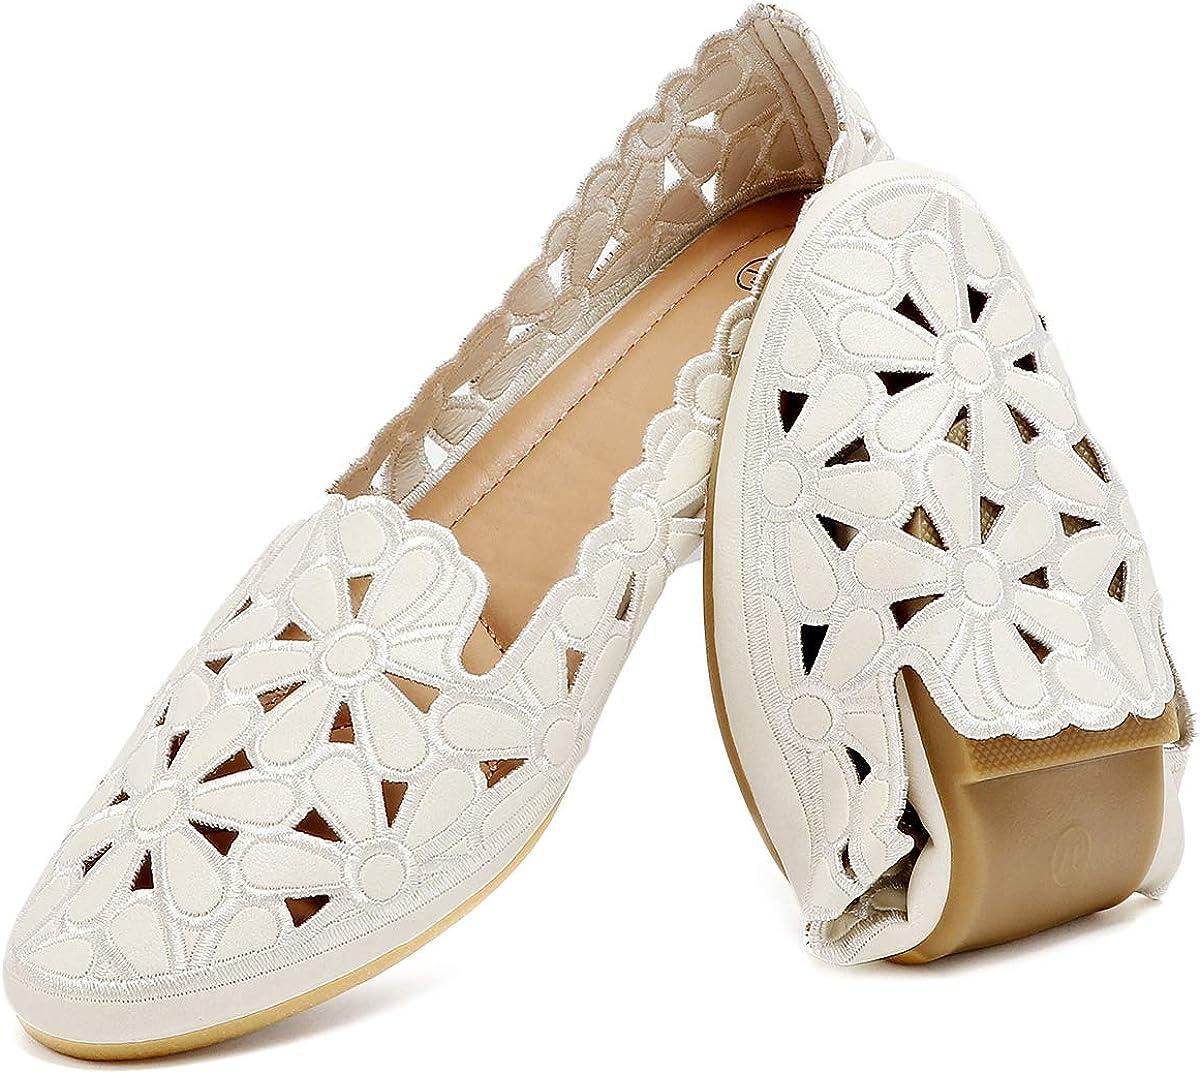 HEAWISH Women's Floral Ballet Flats High quality new for Sacramento Mall O Women Beige Slip Black